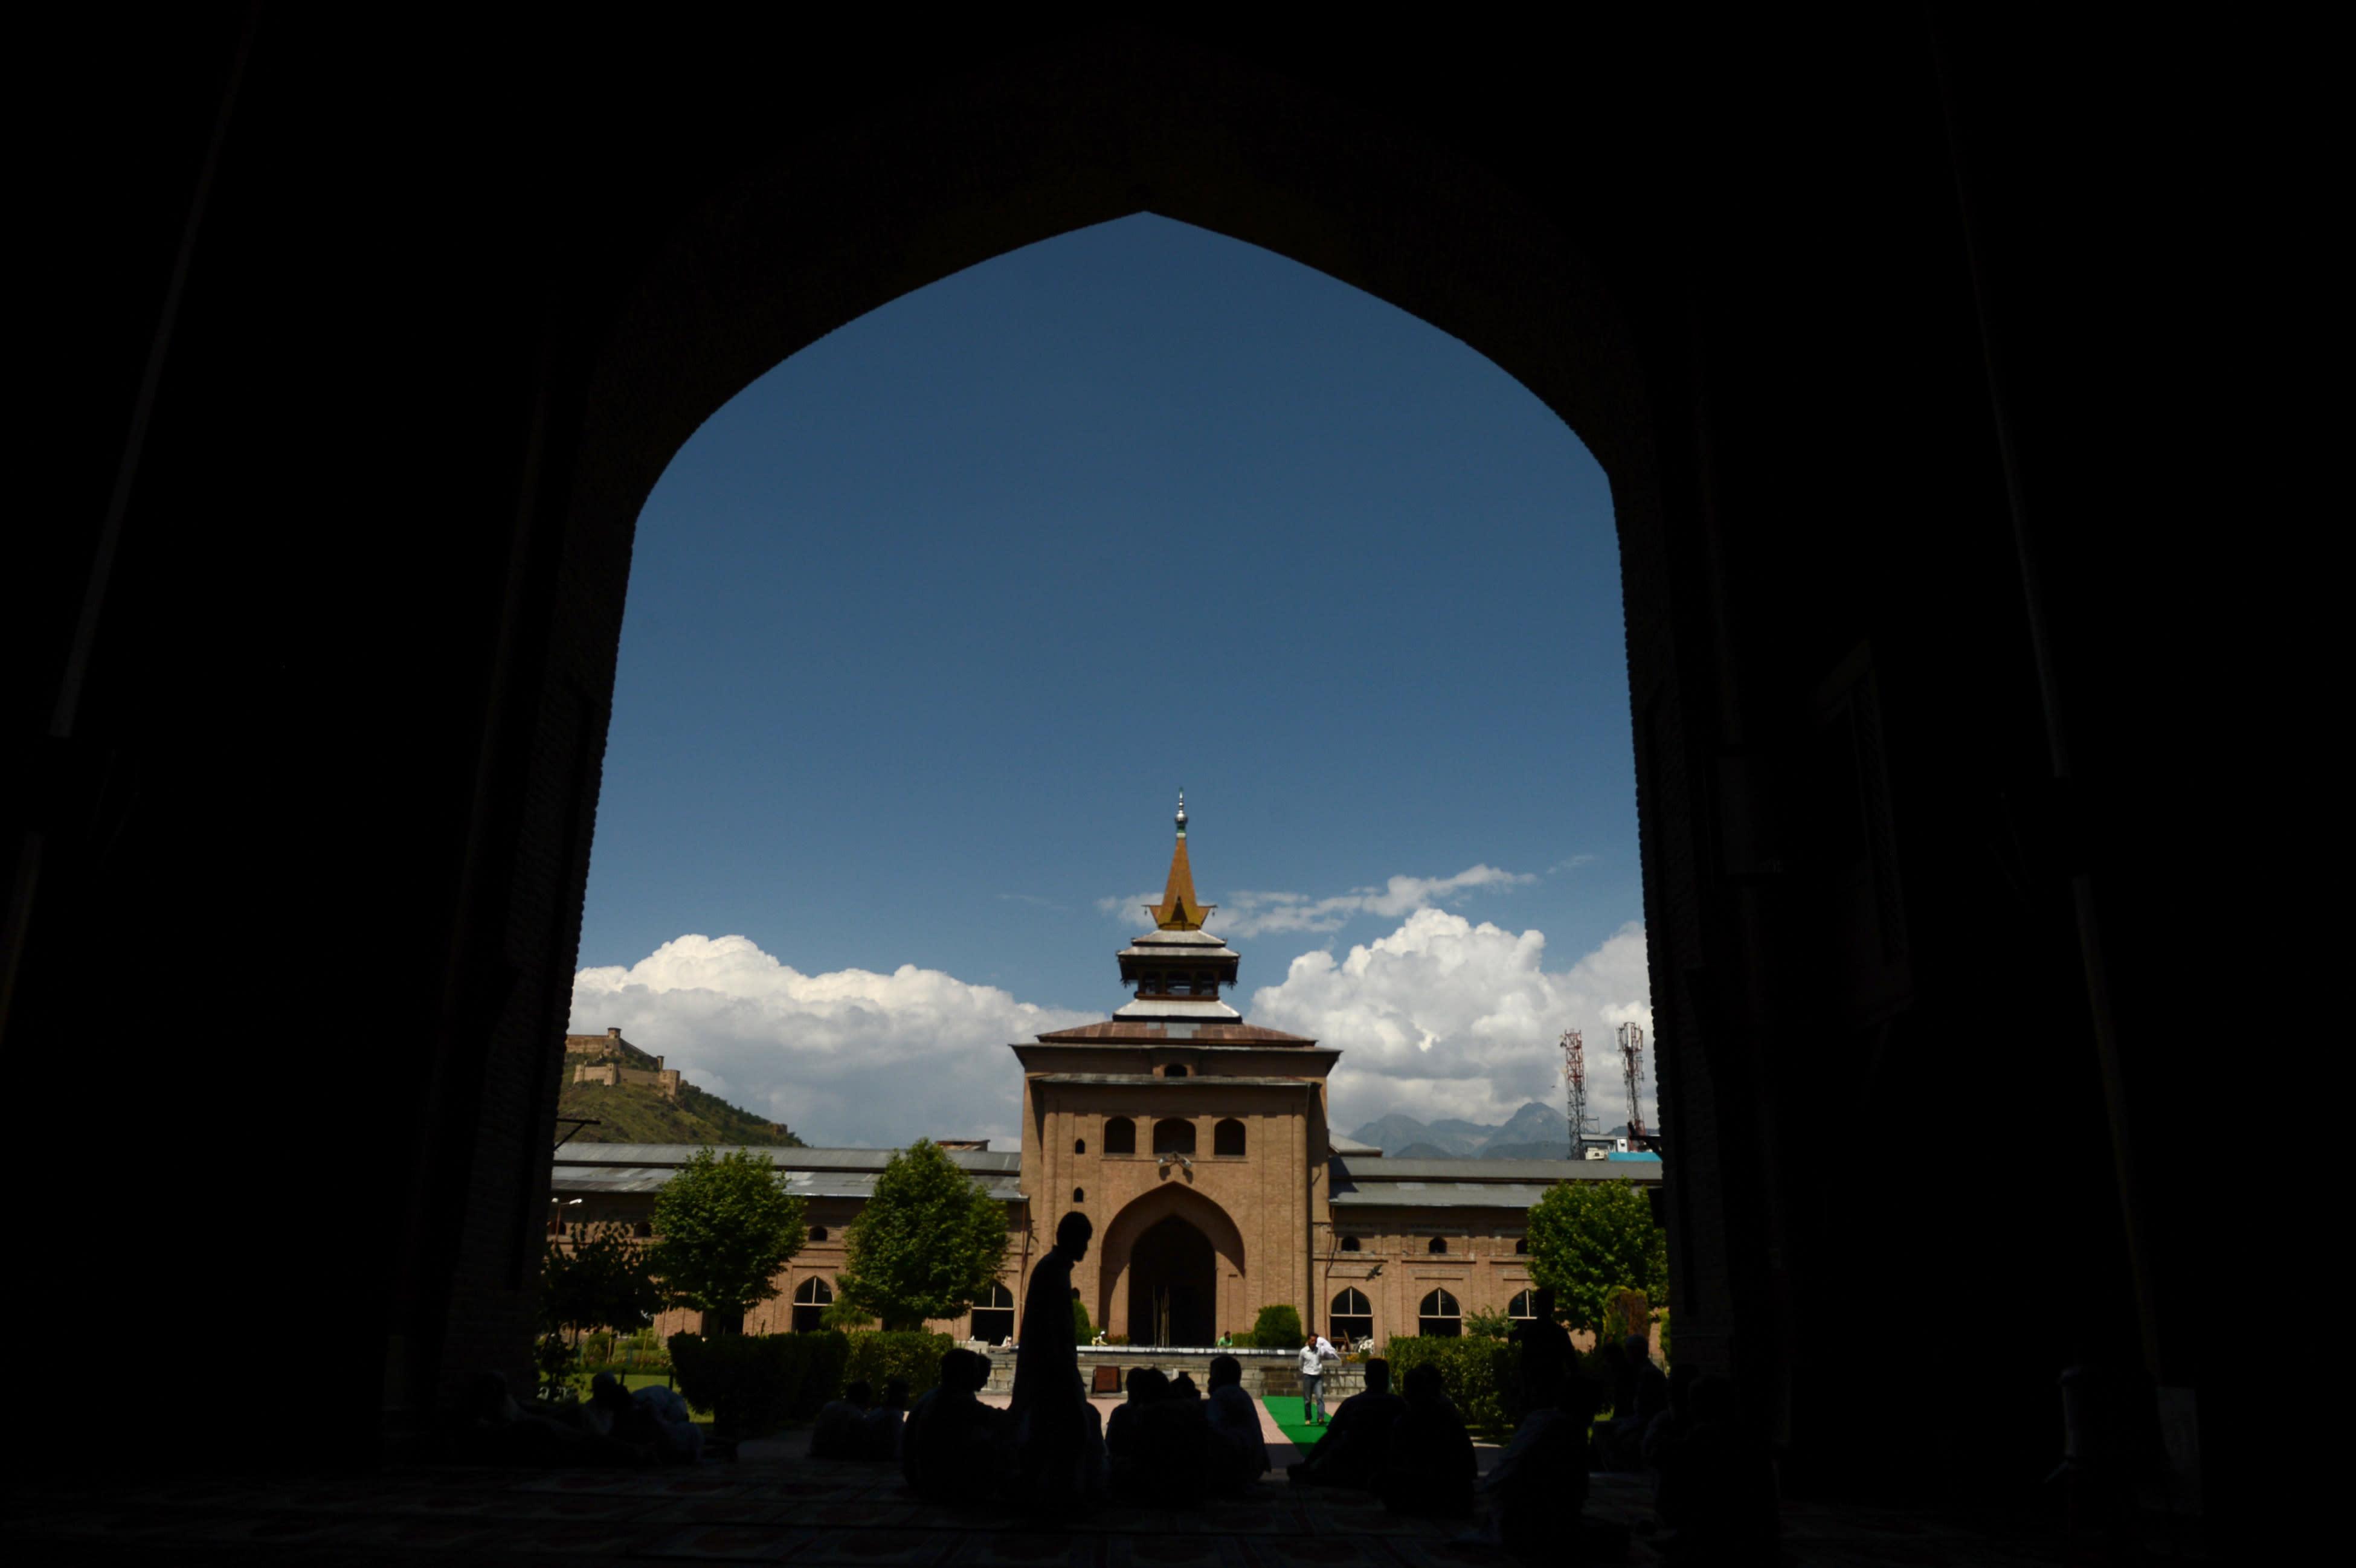 Kashmiri Muslims walk inside the grand mosque Jamia Masjid during Ramadan in downtown Srinagar on July 10, 2014 (AFP Photo/Tauseef Mustafa)